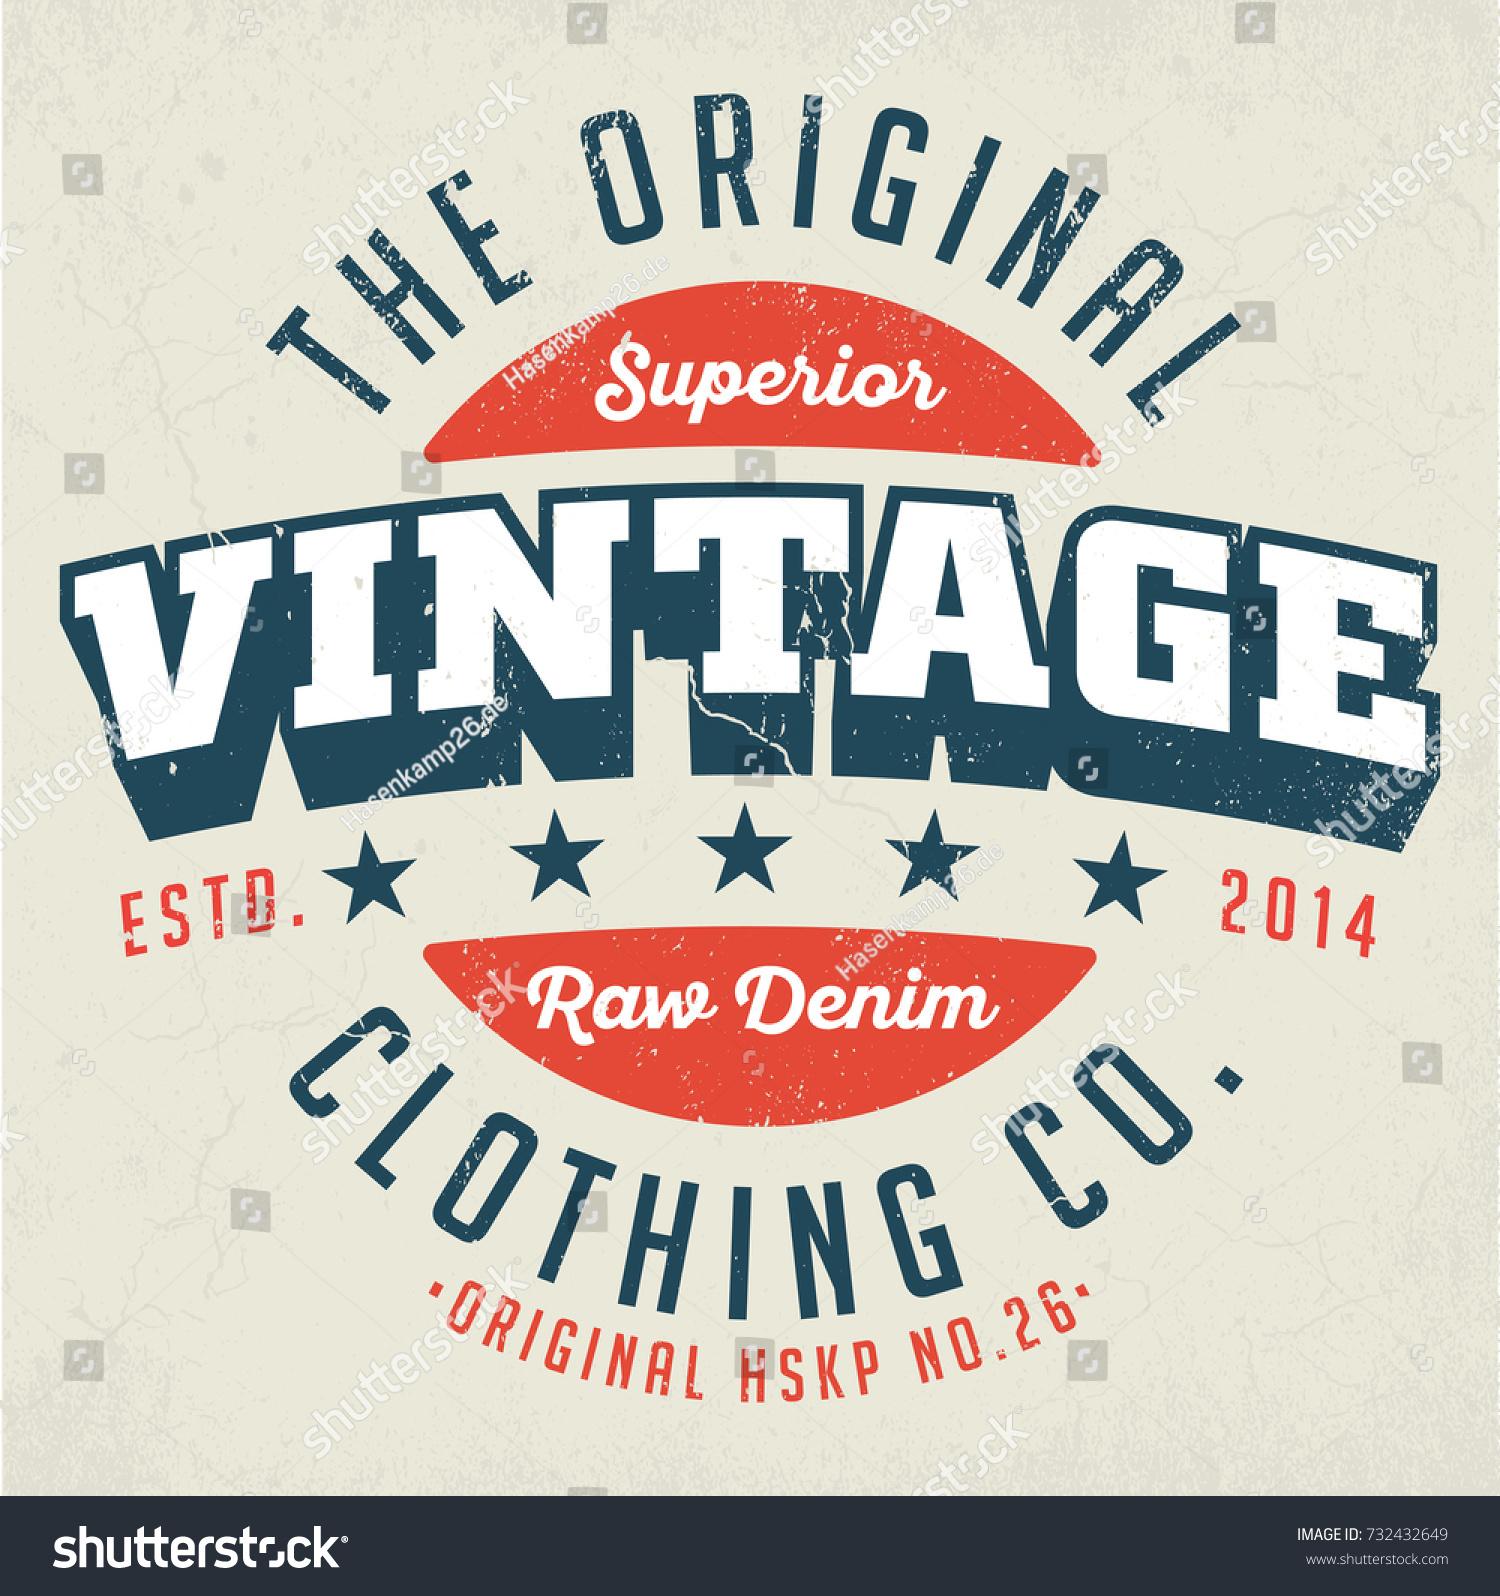 original vintage clothing co design stock vector